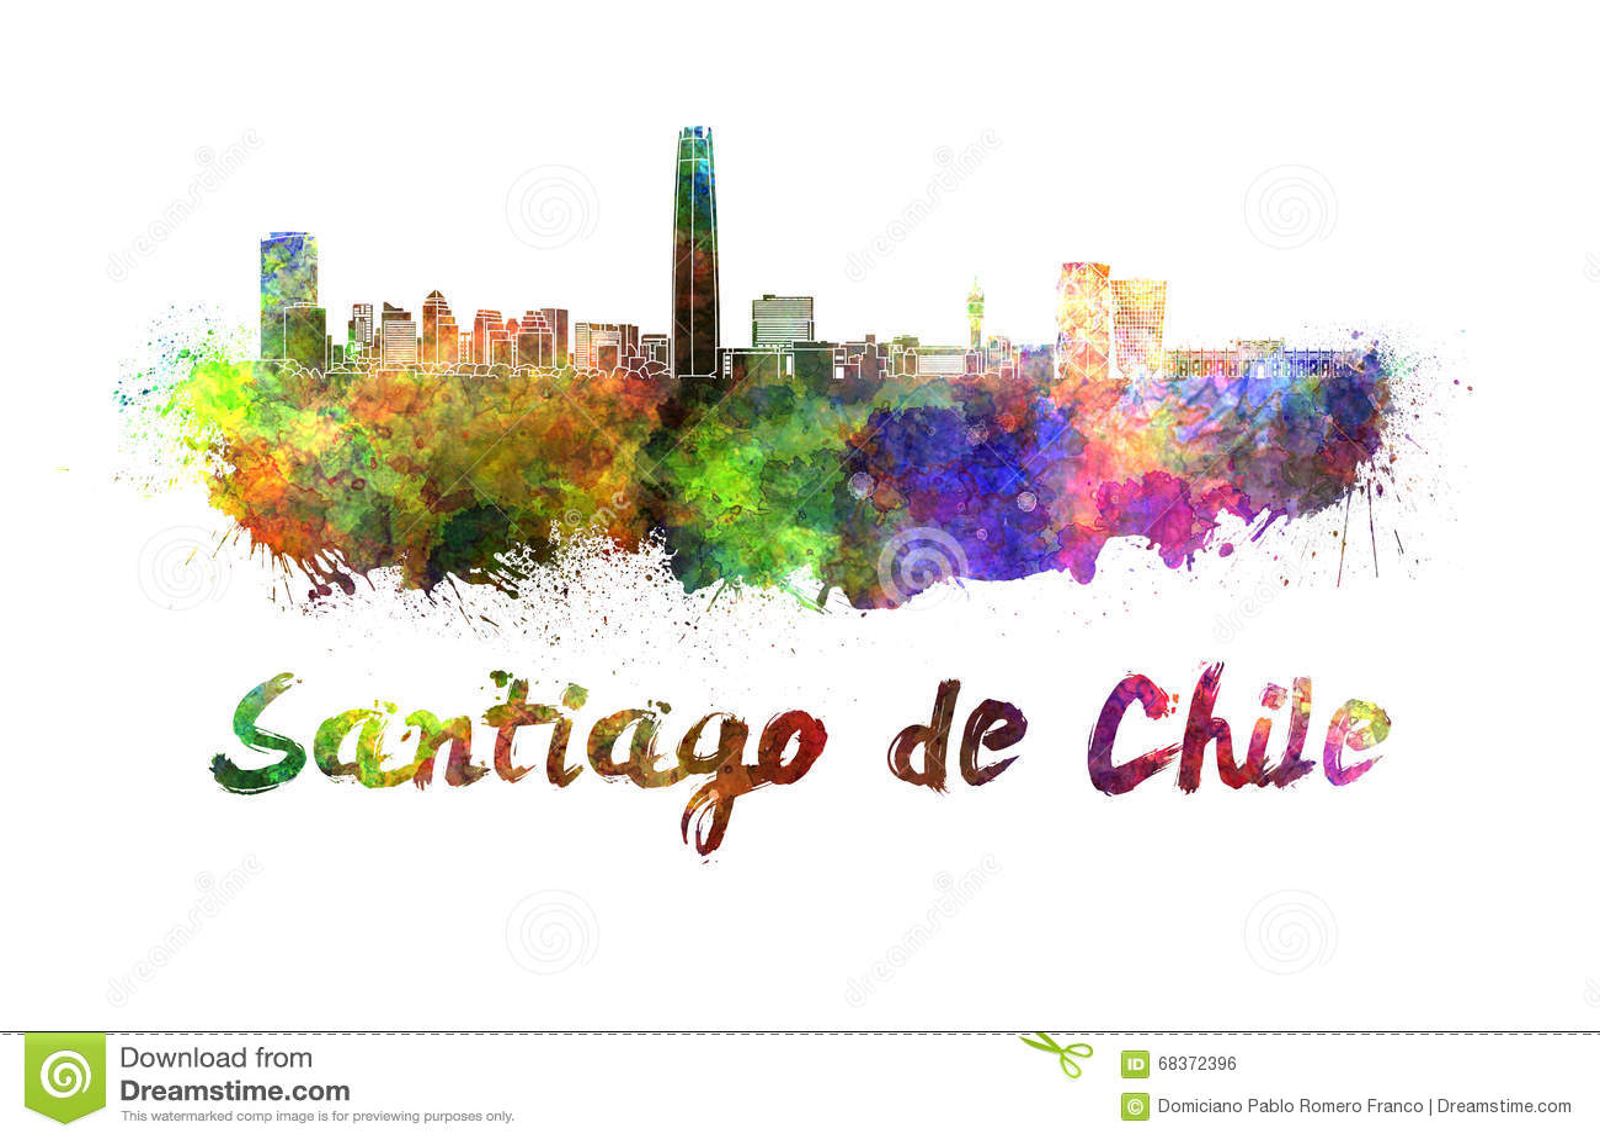 santiago de chile skyline in watercolor stock illustration